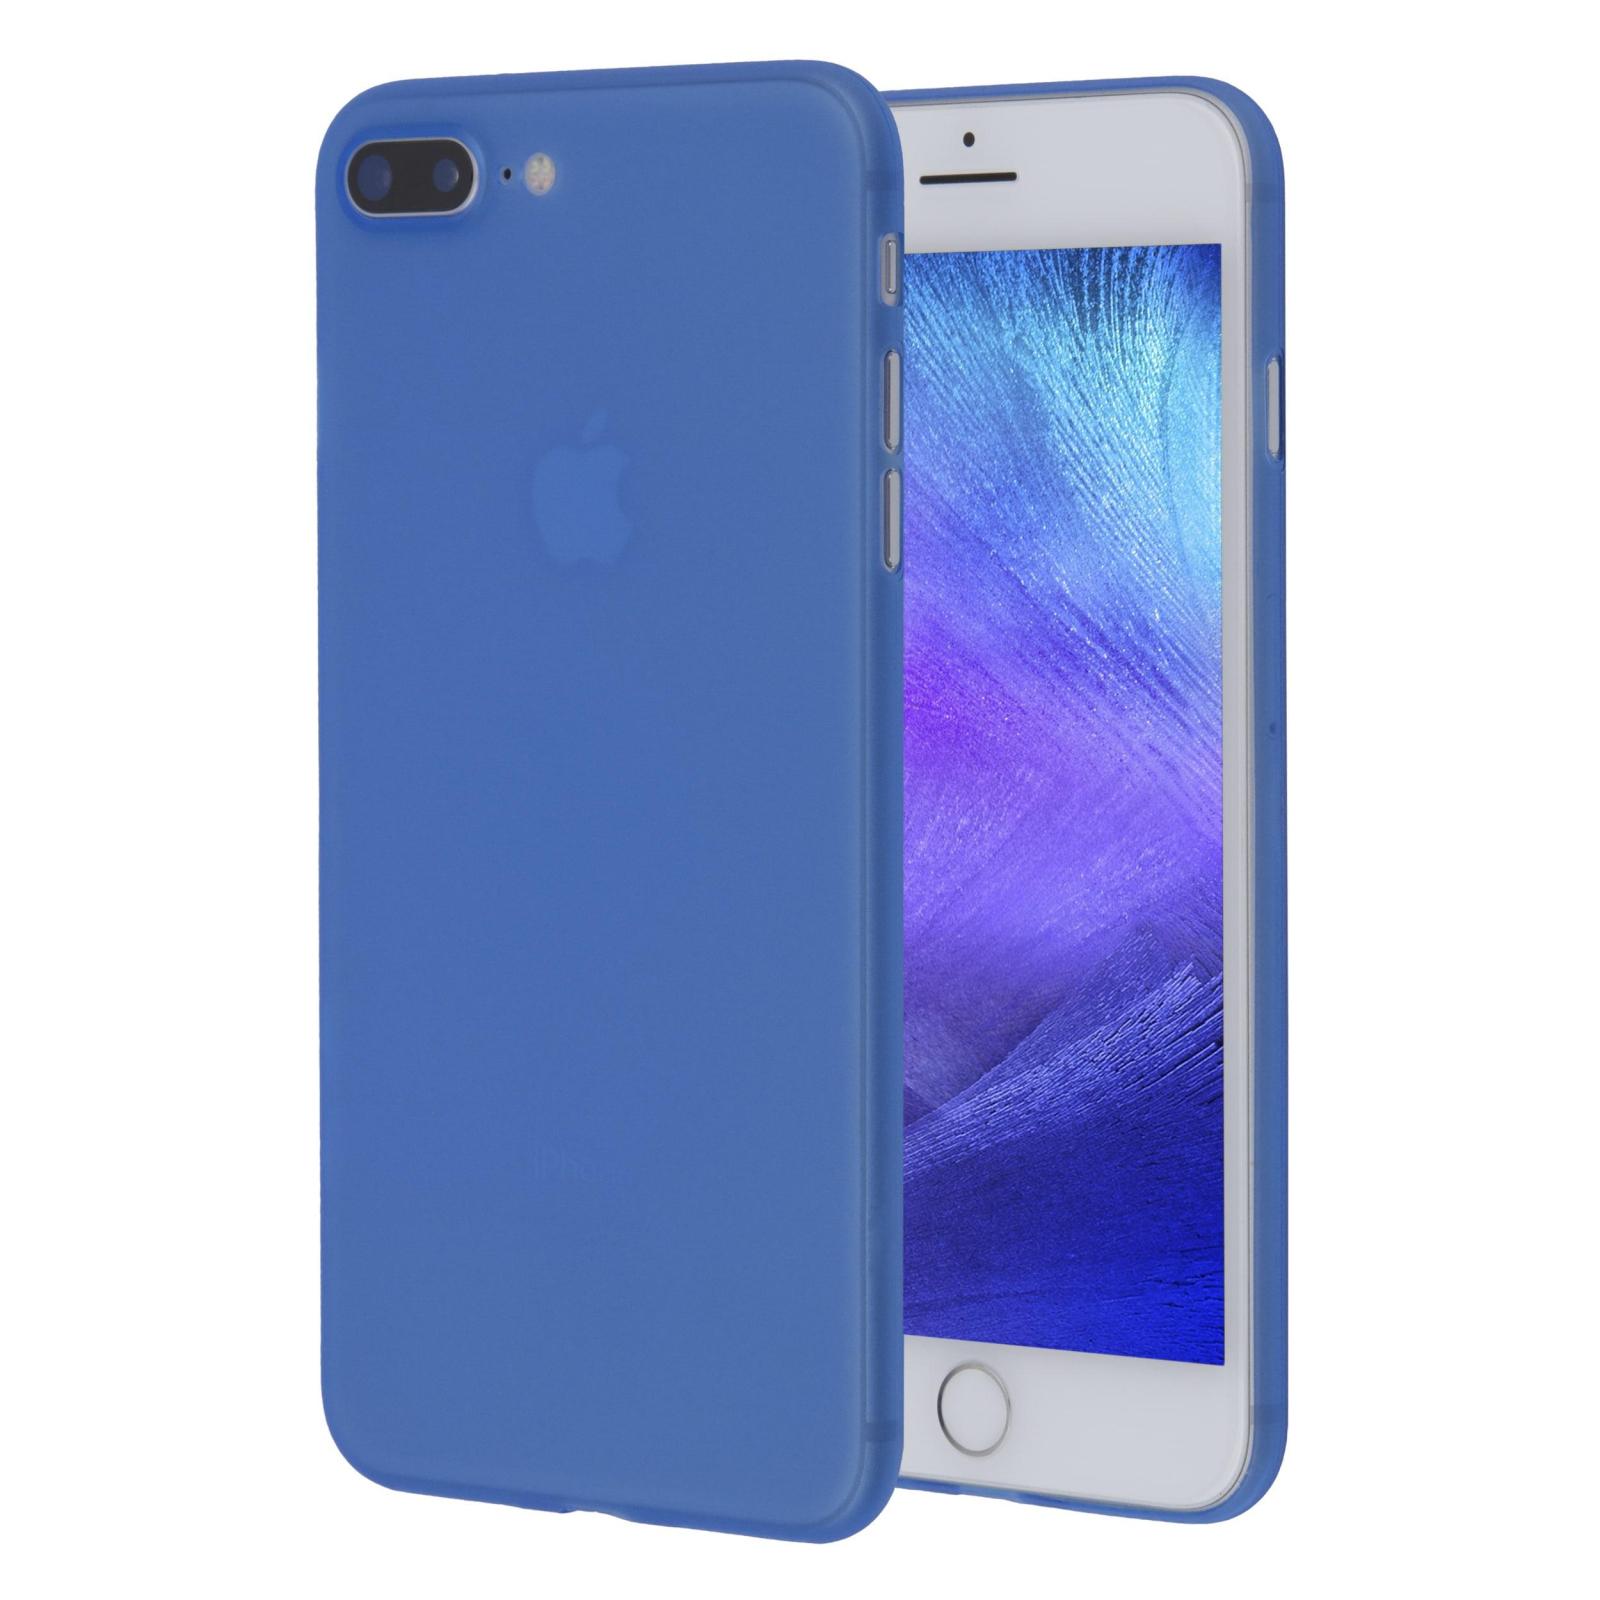 Чехол для моб. телефона MakeFuture PP/Ice Case для Apple iPhone 8 Plus Blue (MCI-AI8PBL) изображение 2